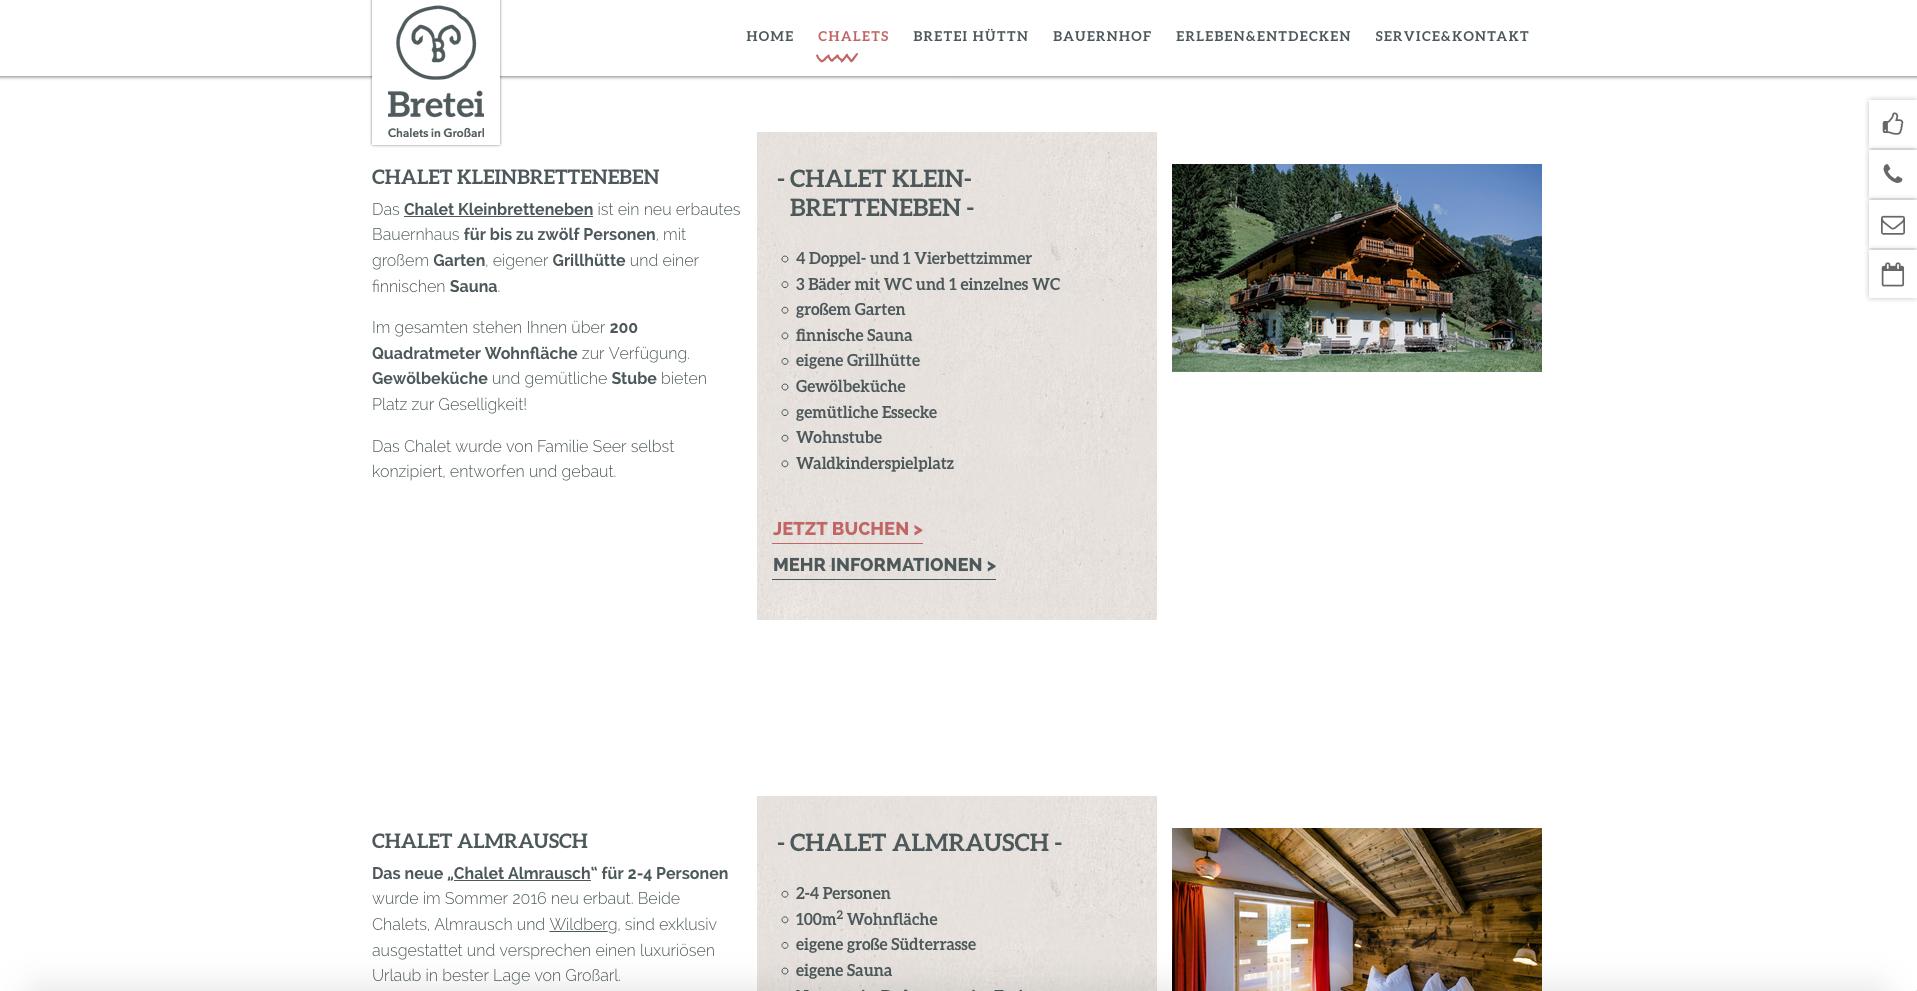 Fresh Herbs Communications Marketing Projektmanagement Website Salzburg_56_Bretei